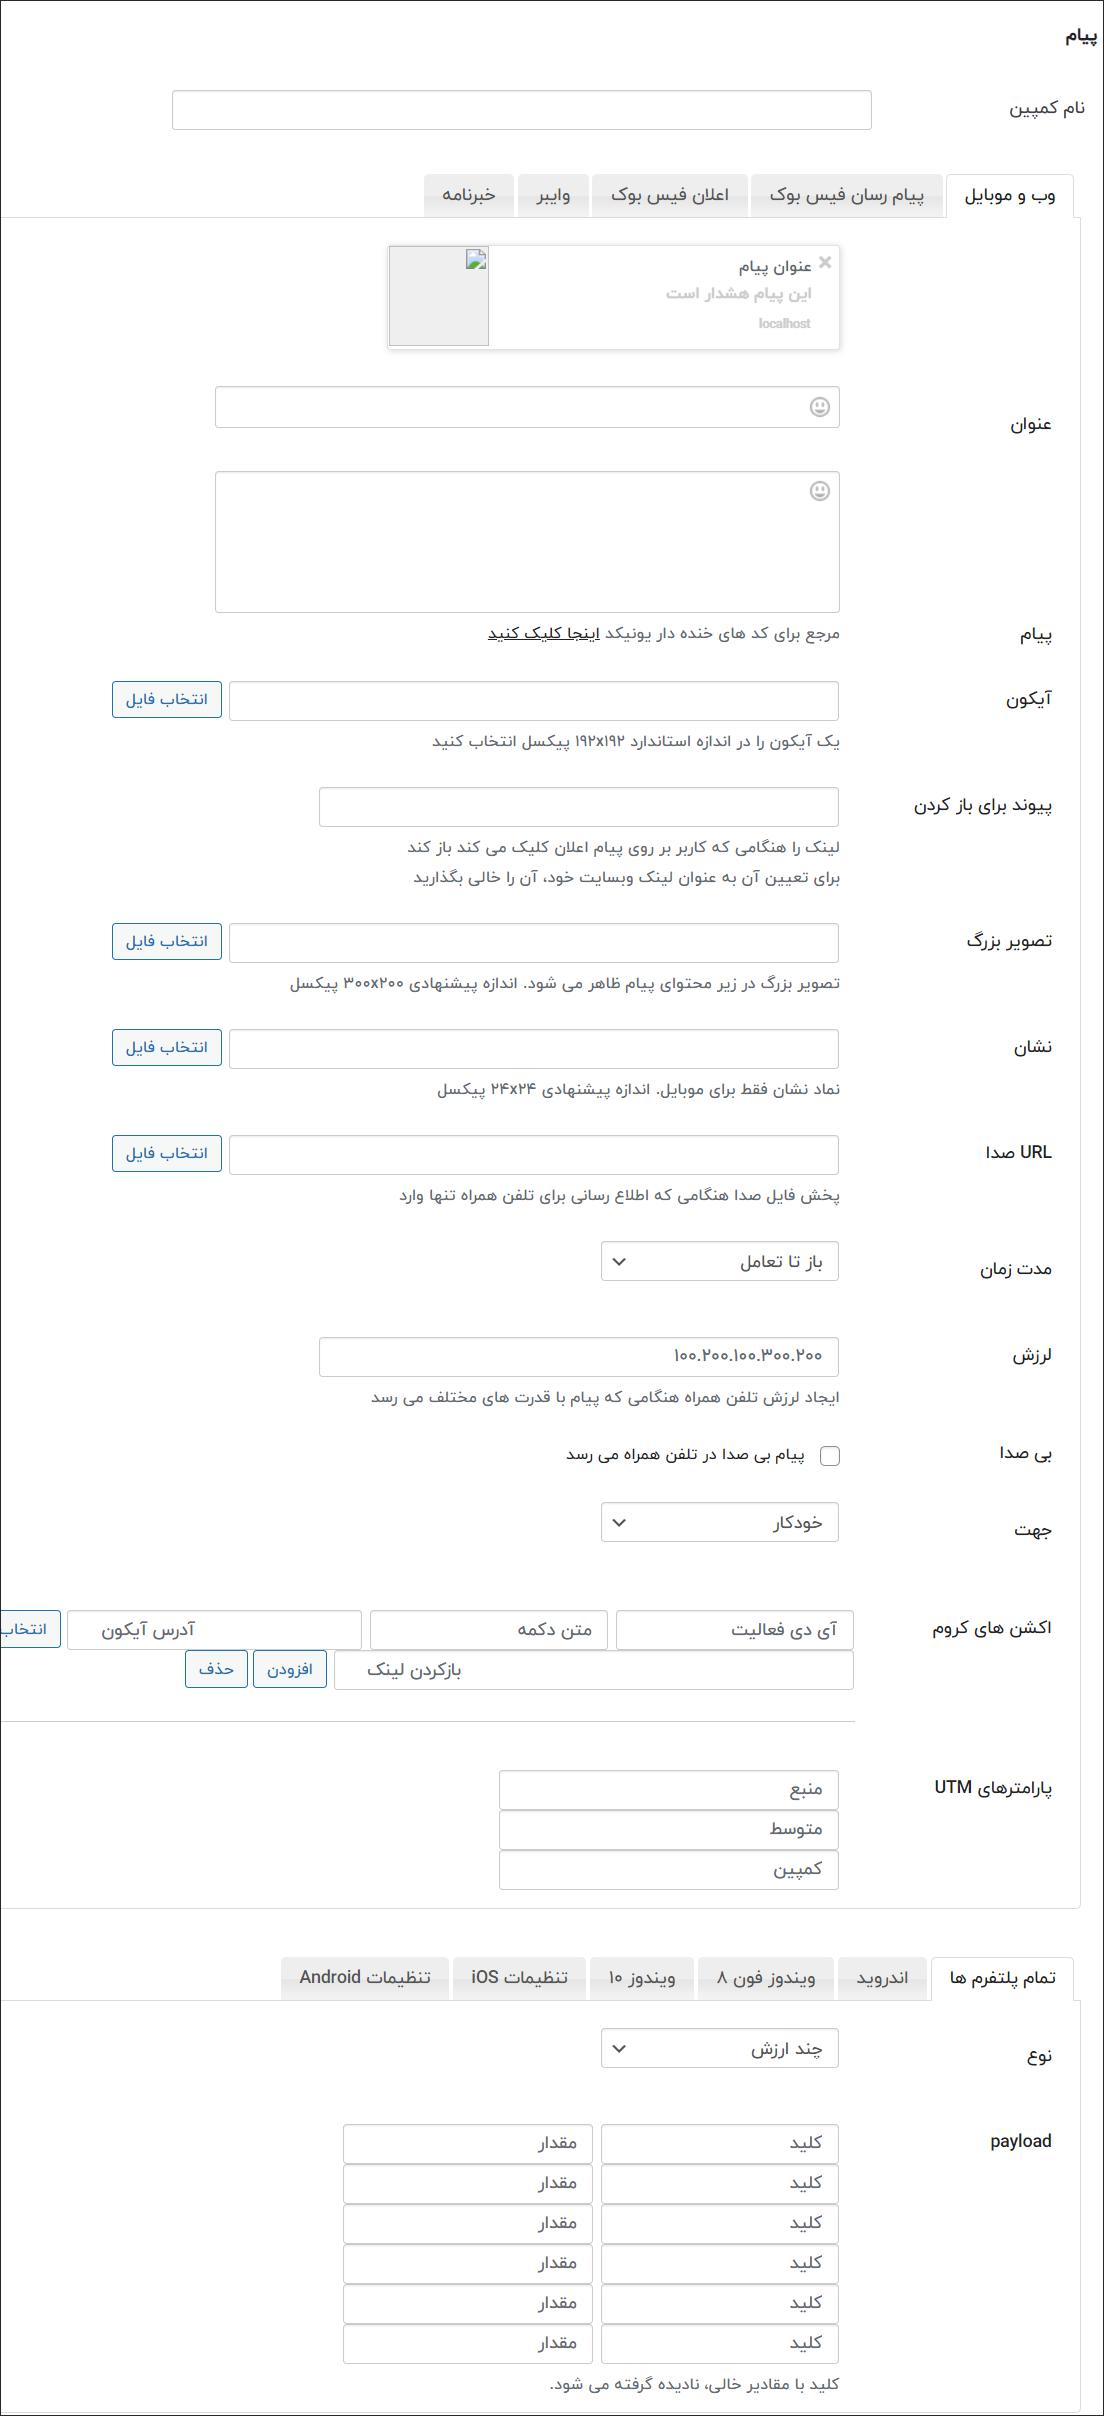 تنظیمات کمپین افزونه ارسال نوتیفیکیشن وردپرس Smart Notification WordPress